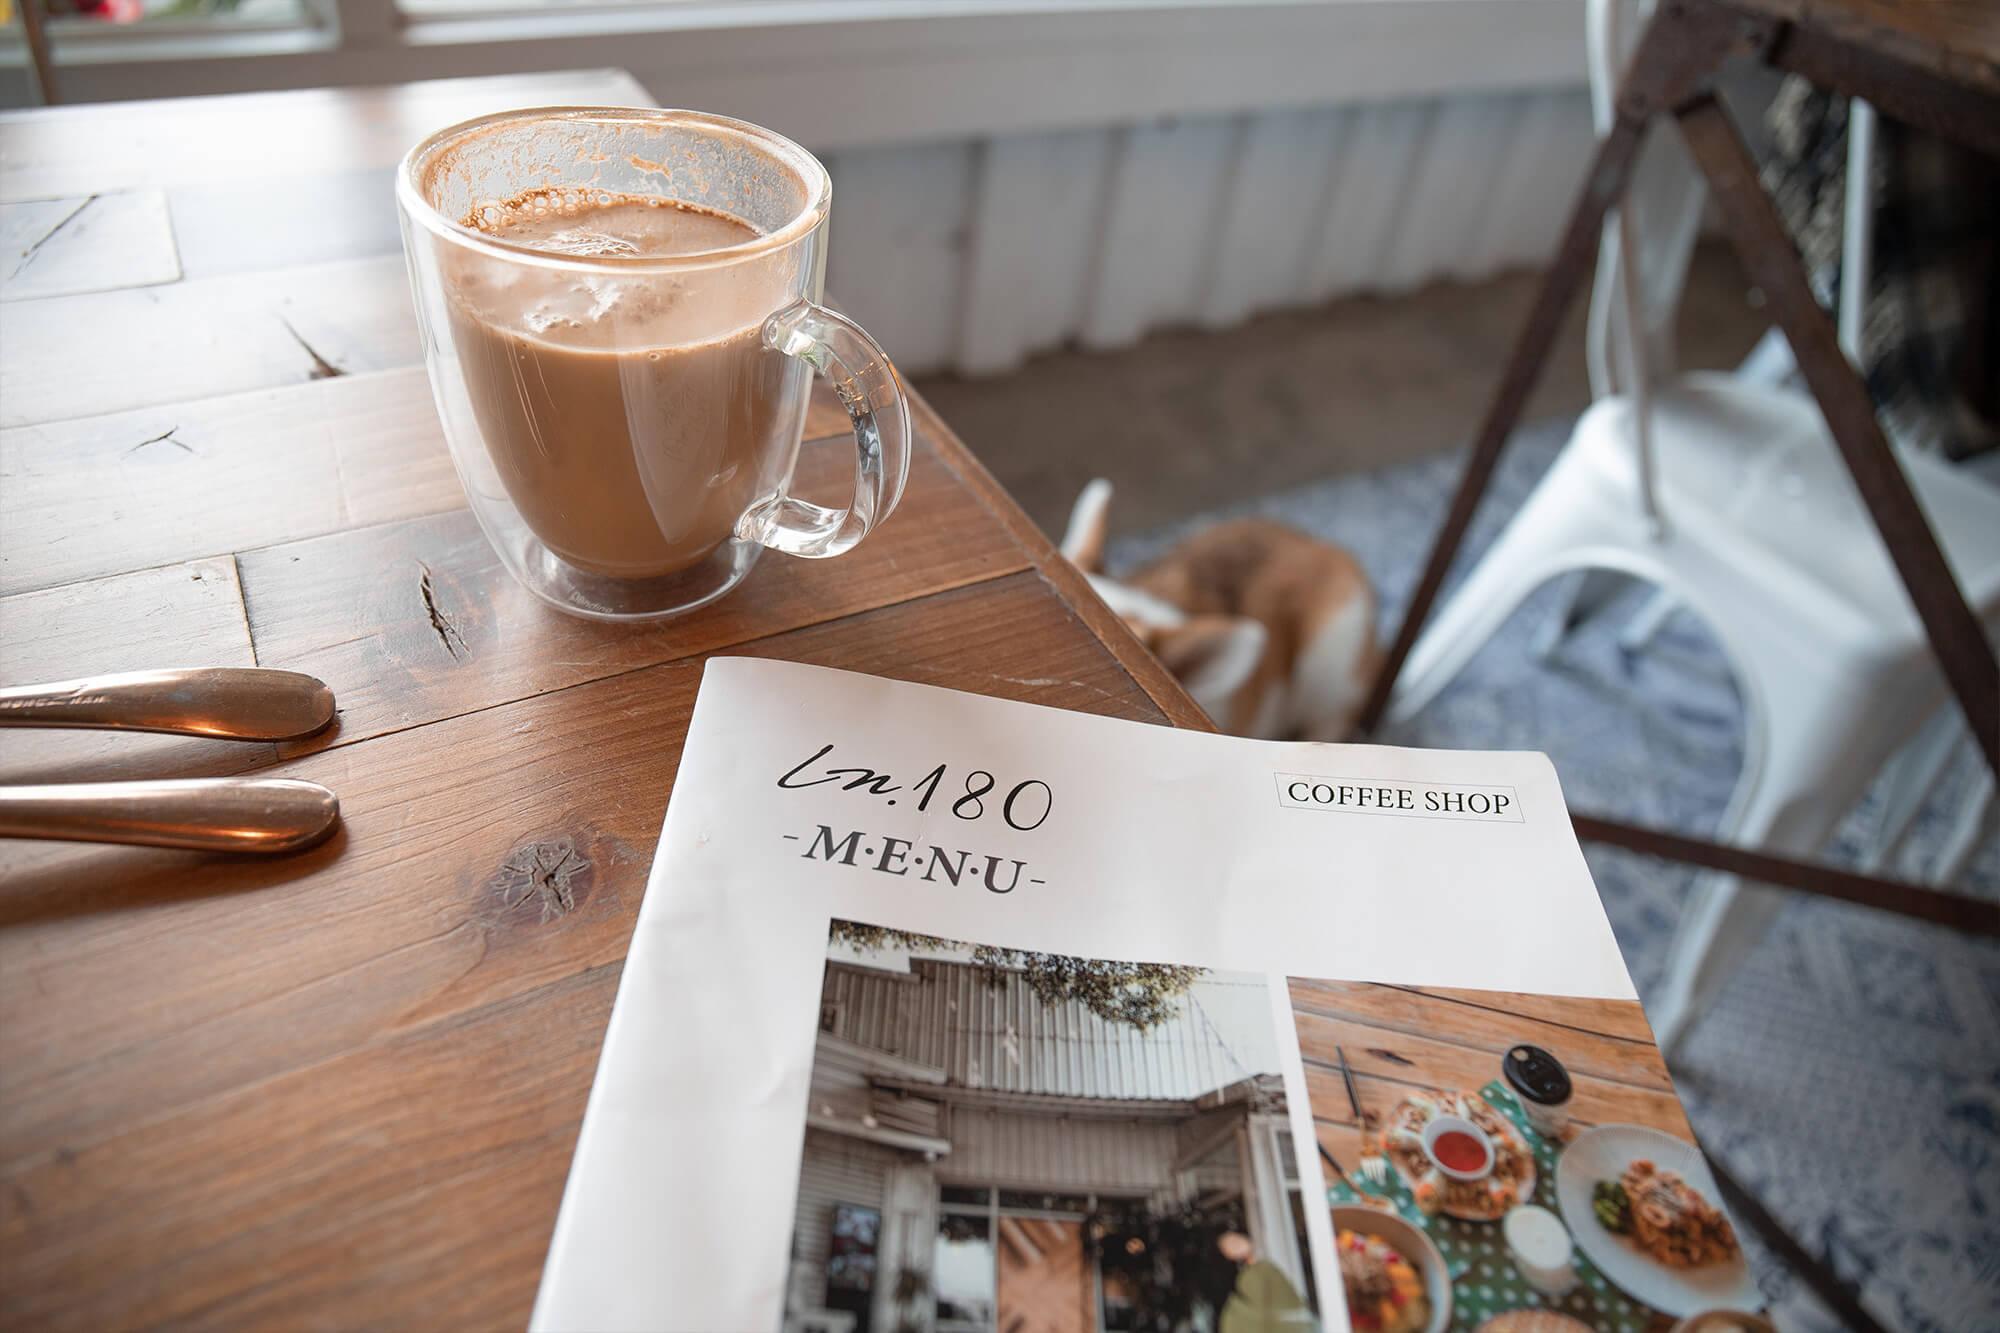 Ln180 Cafe_memu